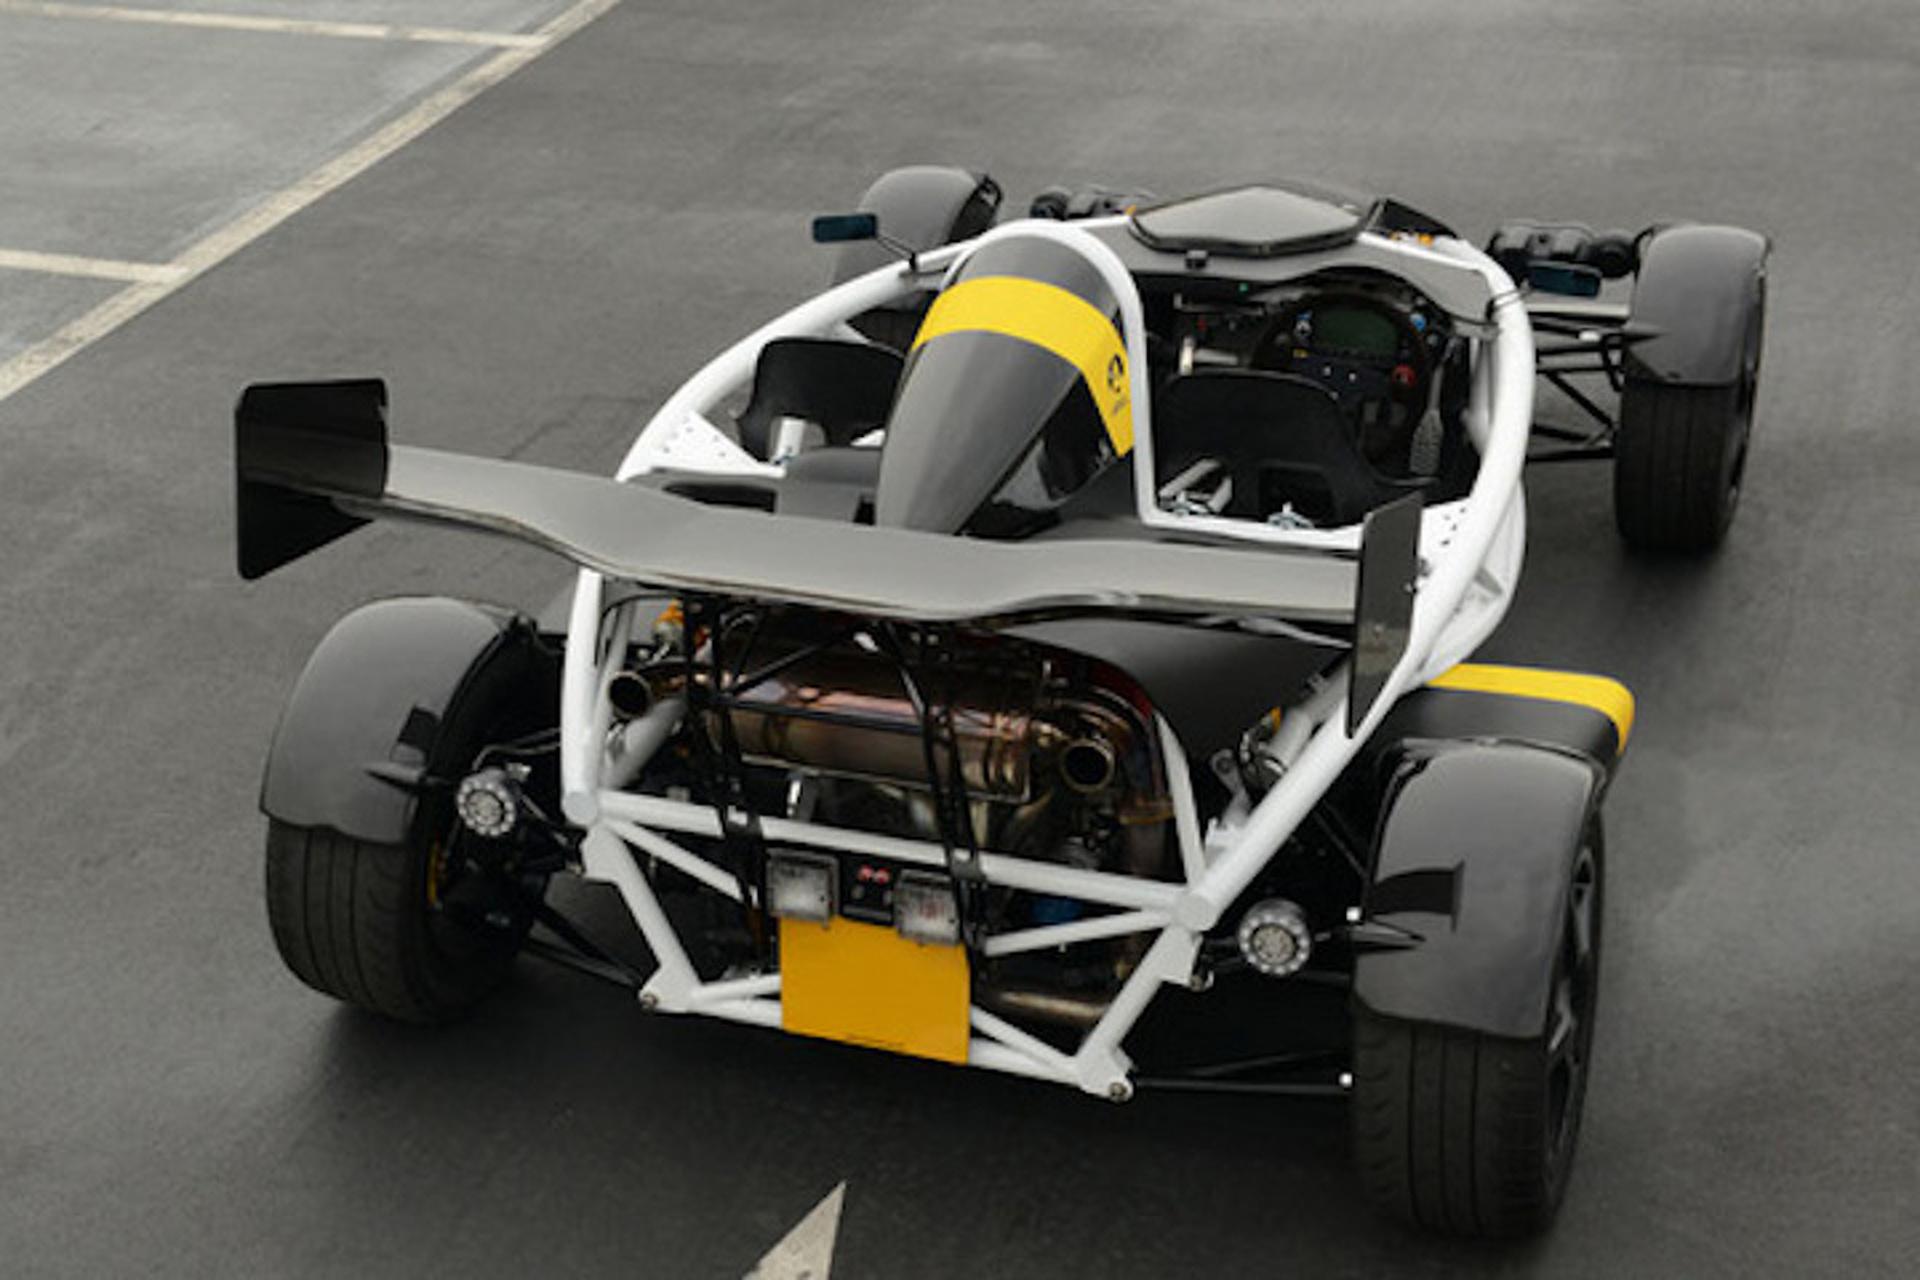 Ariel Atom 3.5R Debuts With Minimalist Looks, Supercar Power